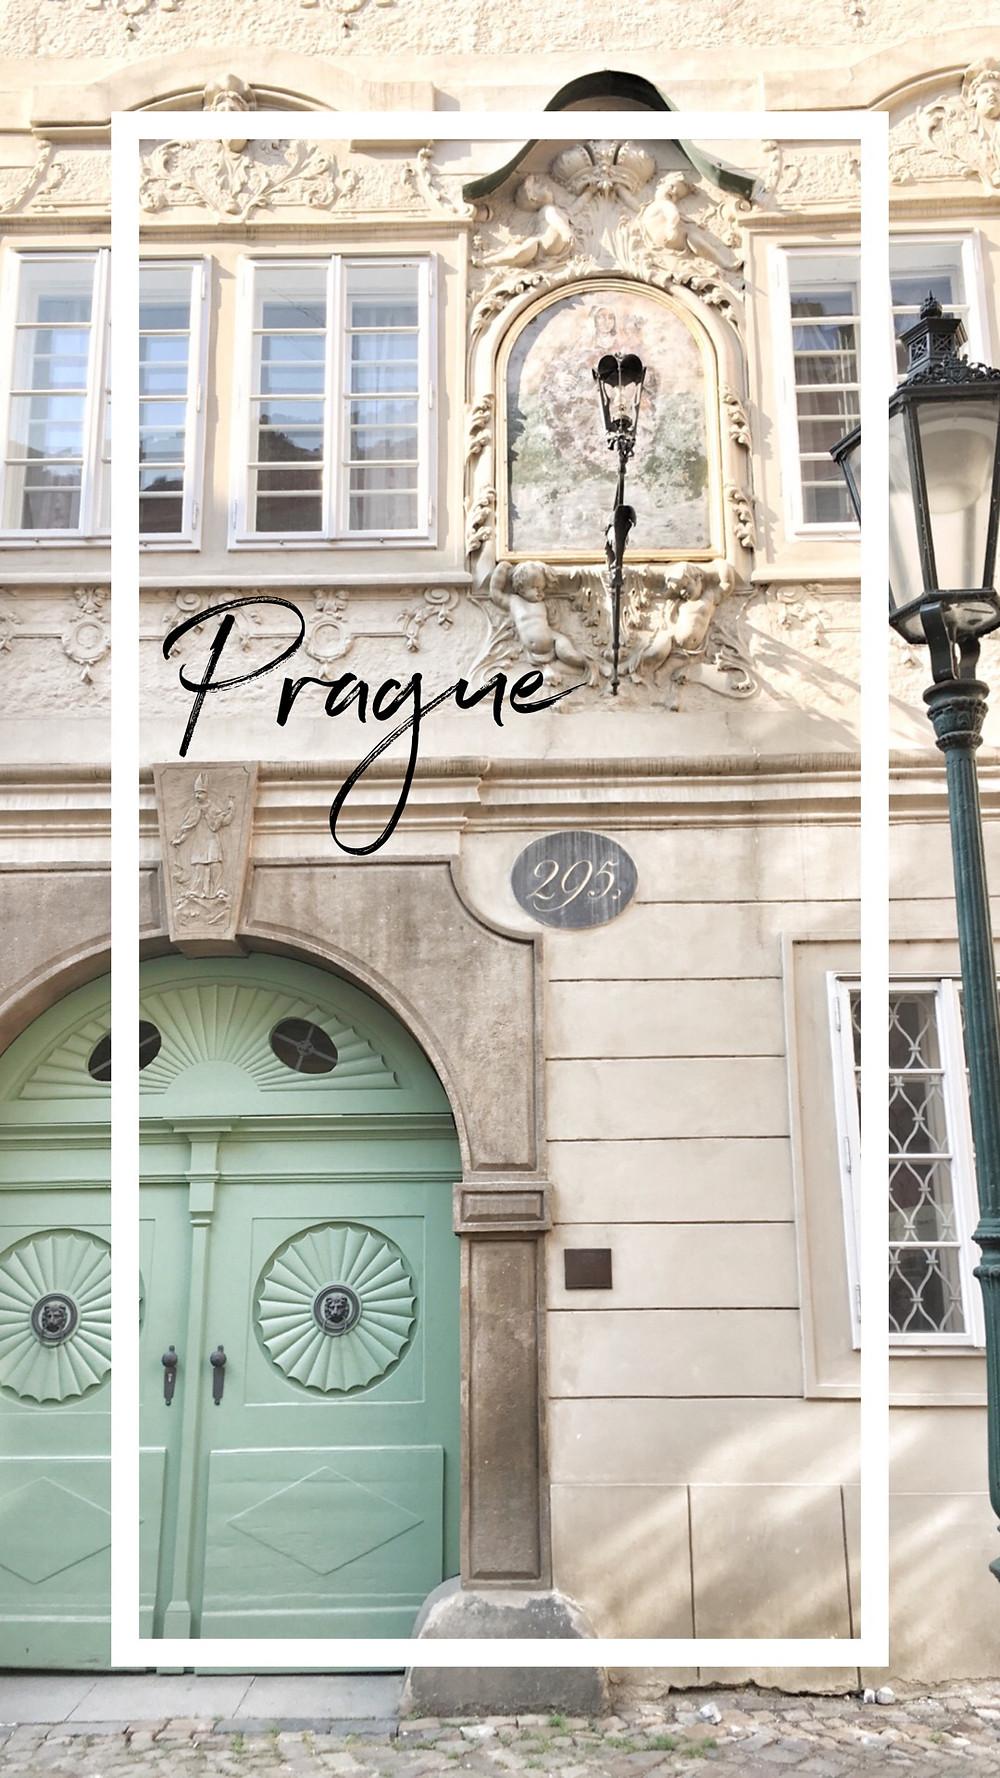 Lonnies Planet Pinterest post of Prague